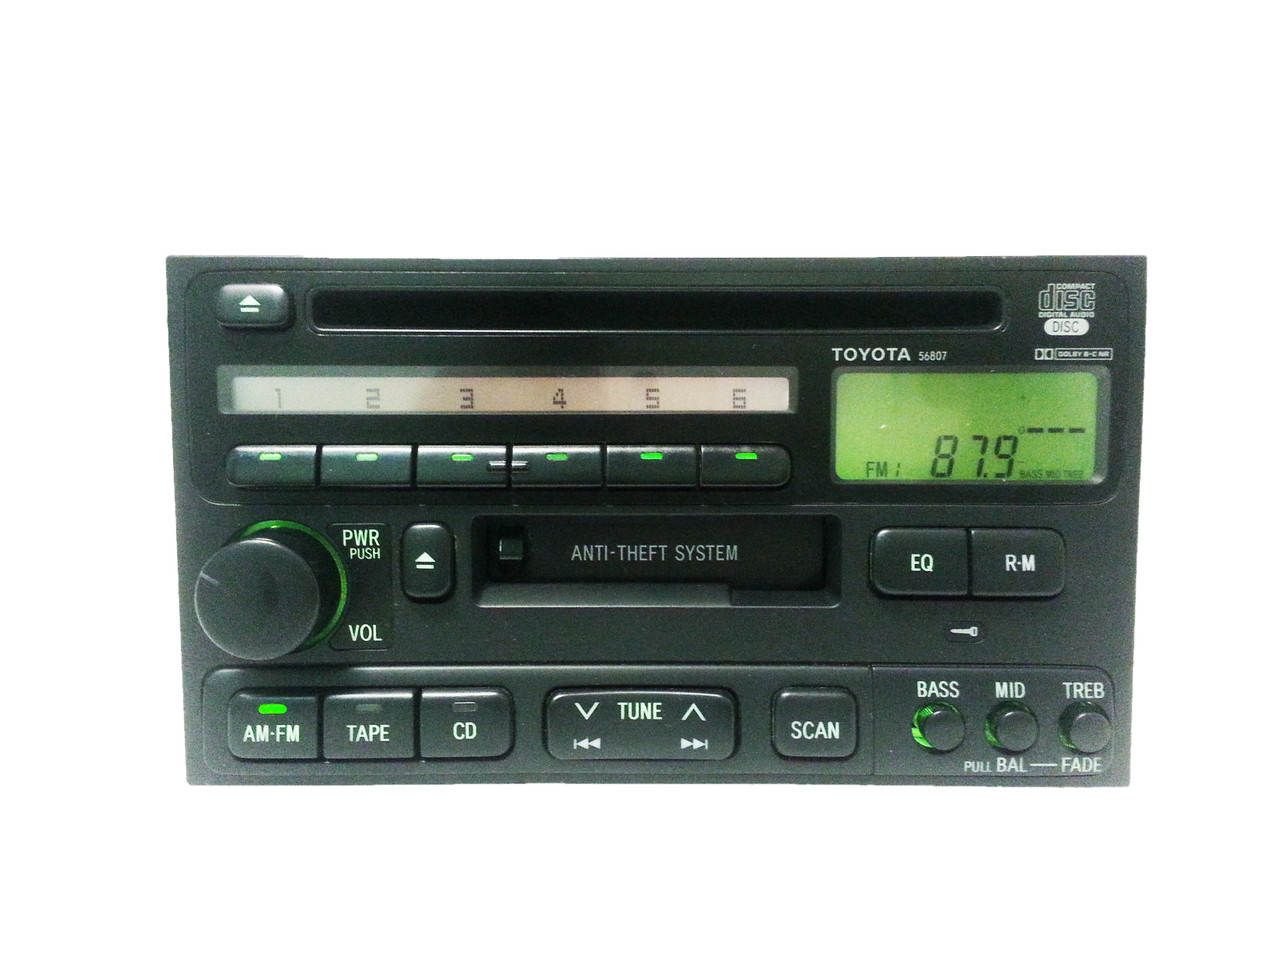 small resolution of toyota factory oem radio tape and cd player 4runner avalon camry celica land cruiser solara sienna 56807 86120 33040 1990 1991 1992 1993 1994 1995 1996